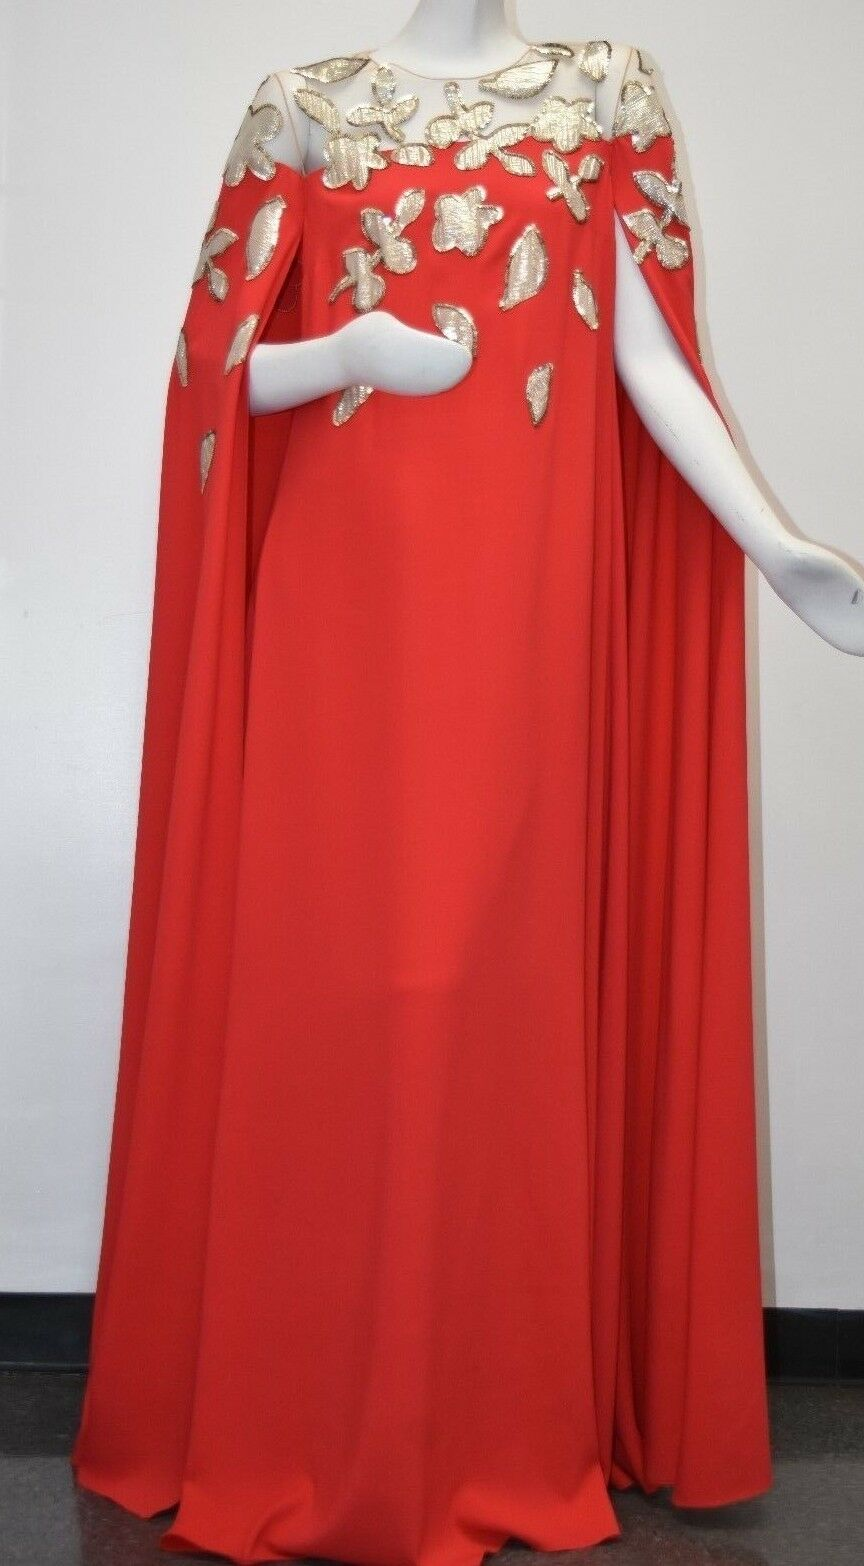 Neu Oscar De La Renta Seide Kaftan Umhang Abendkleid Rot Illusion Gold Lame